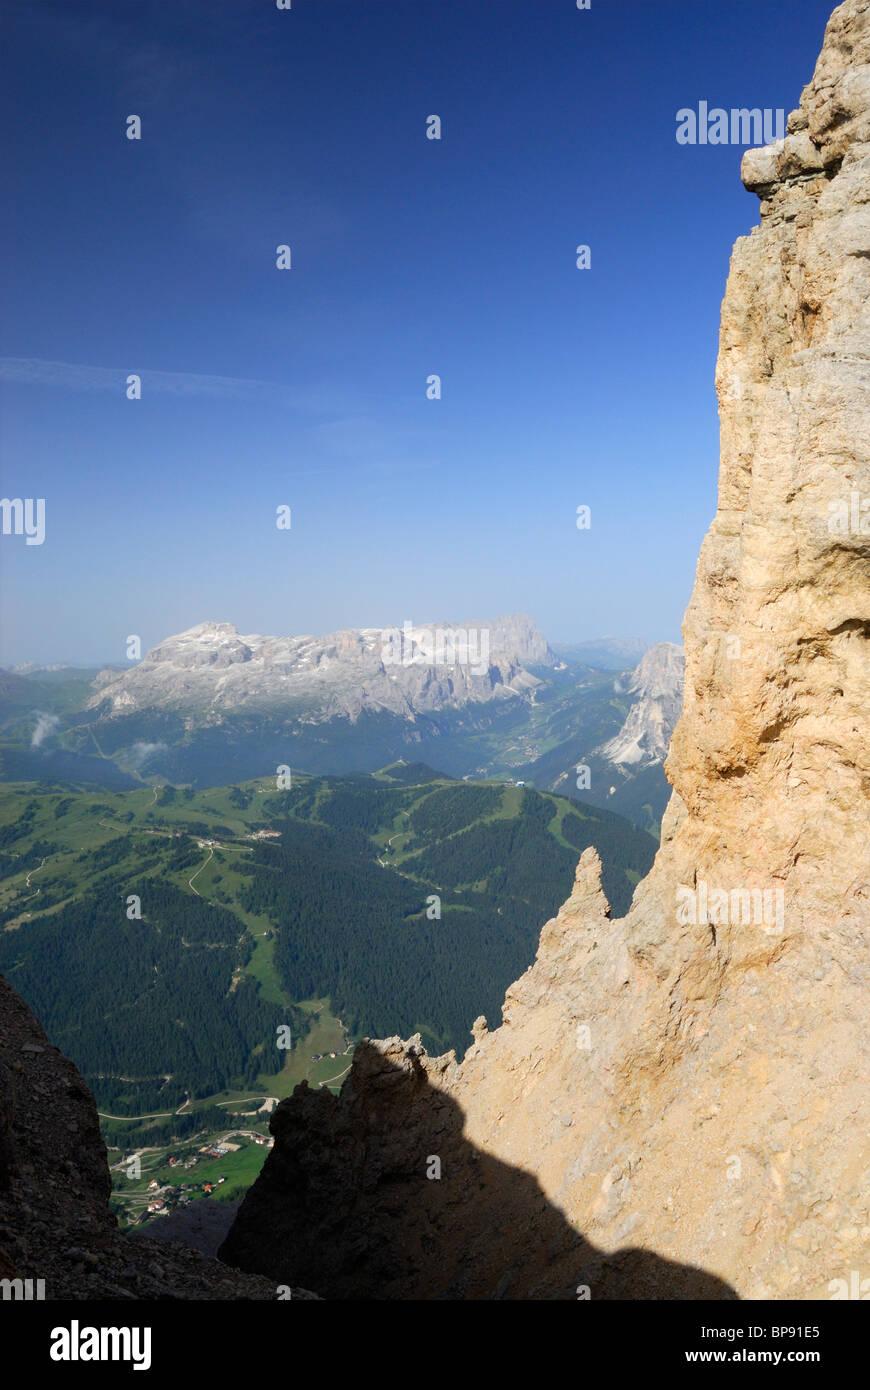 Vue depuis la Varella de Sella, Naturpark Fanes-Sennes-Prags, Dolomites, Trentino-Alto Adige/Tyrol du Sud, Italie Banque D'Images